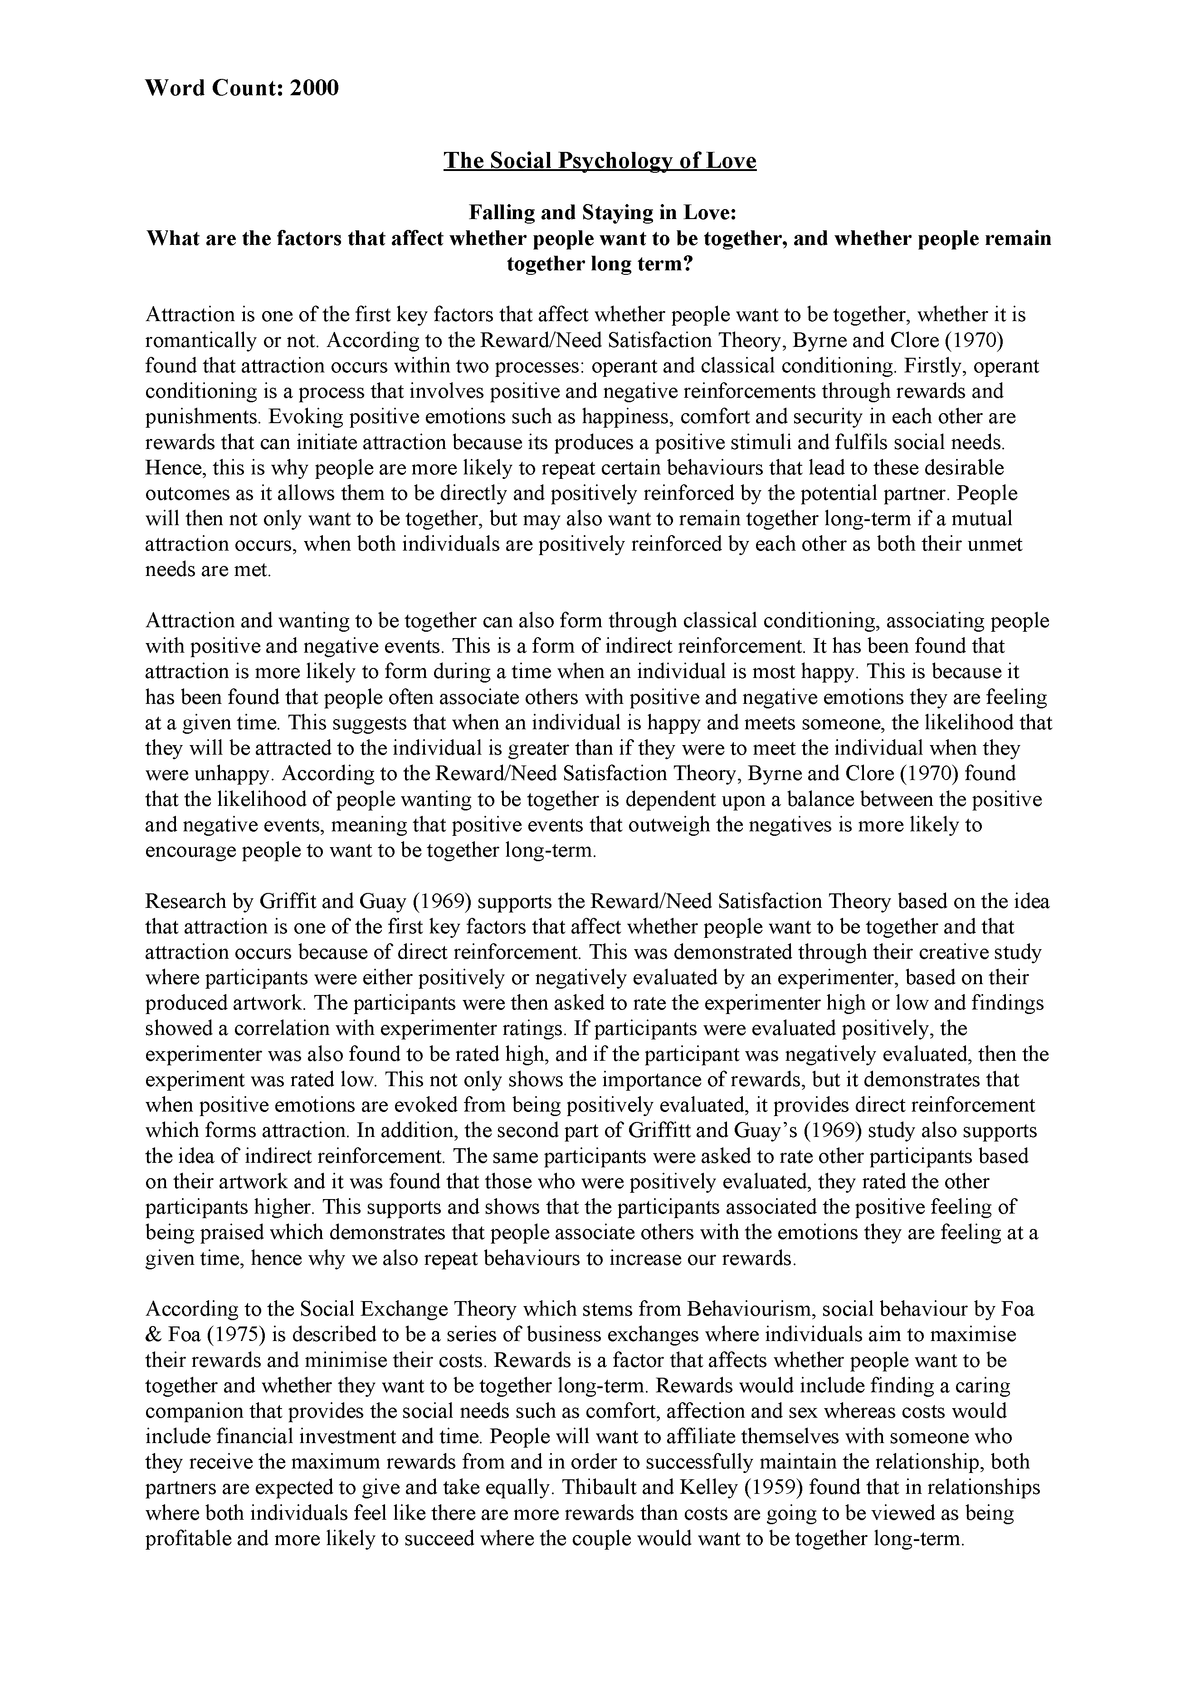 Social Psychology Essay - PY5202 - UEL - StuDocu